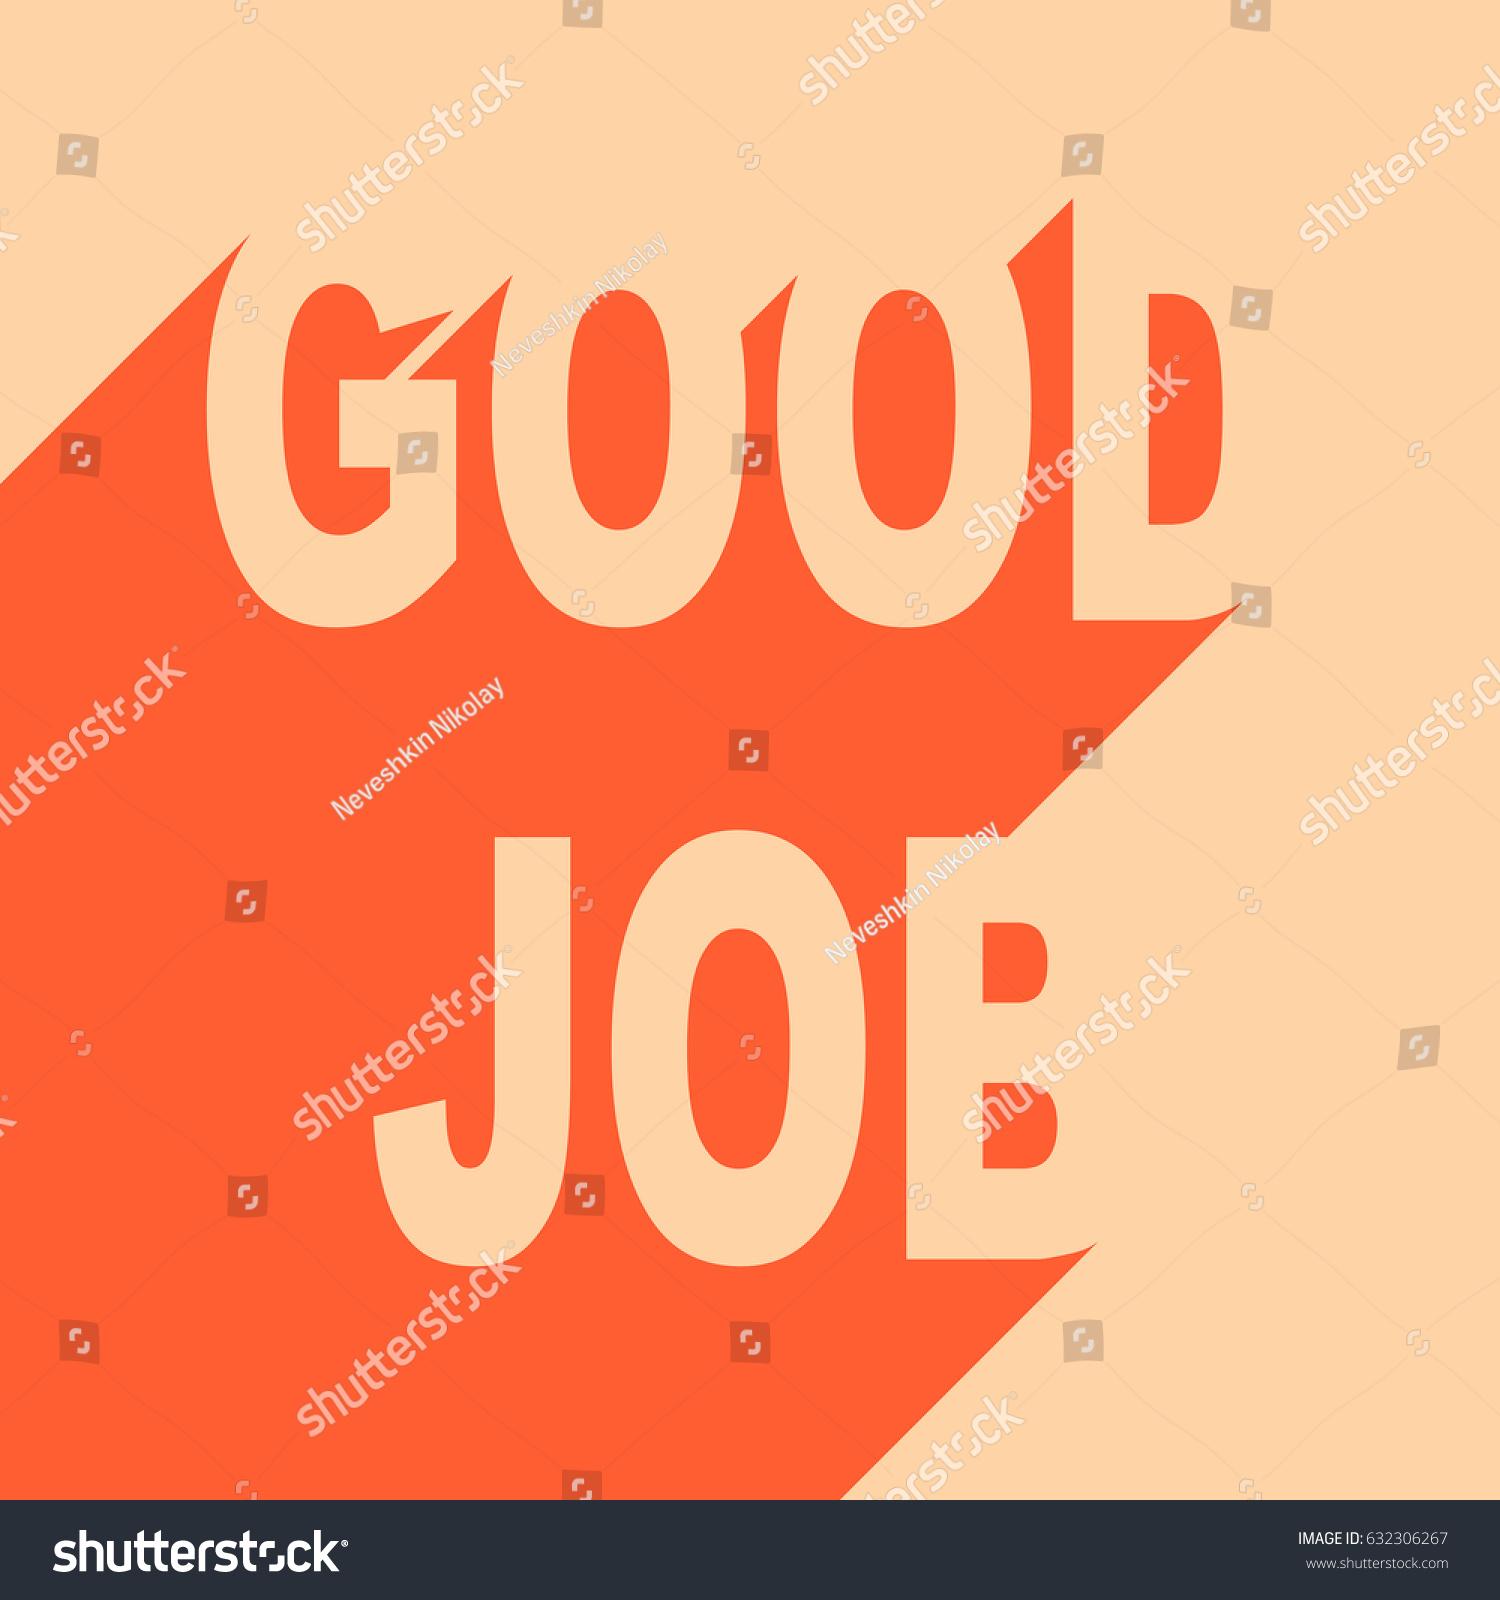 Good Job Quotes Motivating Quotes Vector Background Good Job Stock Vector